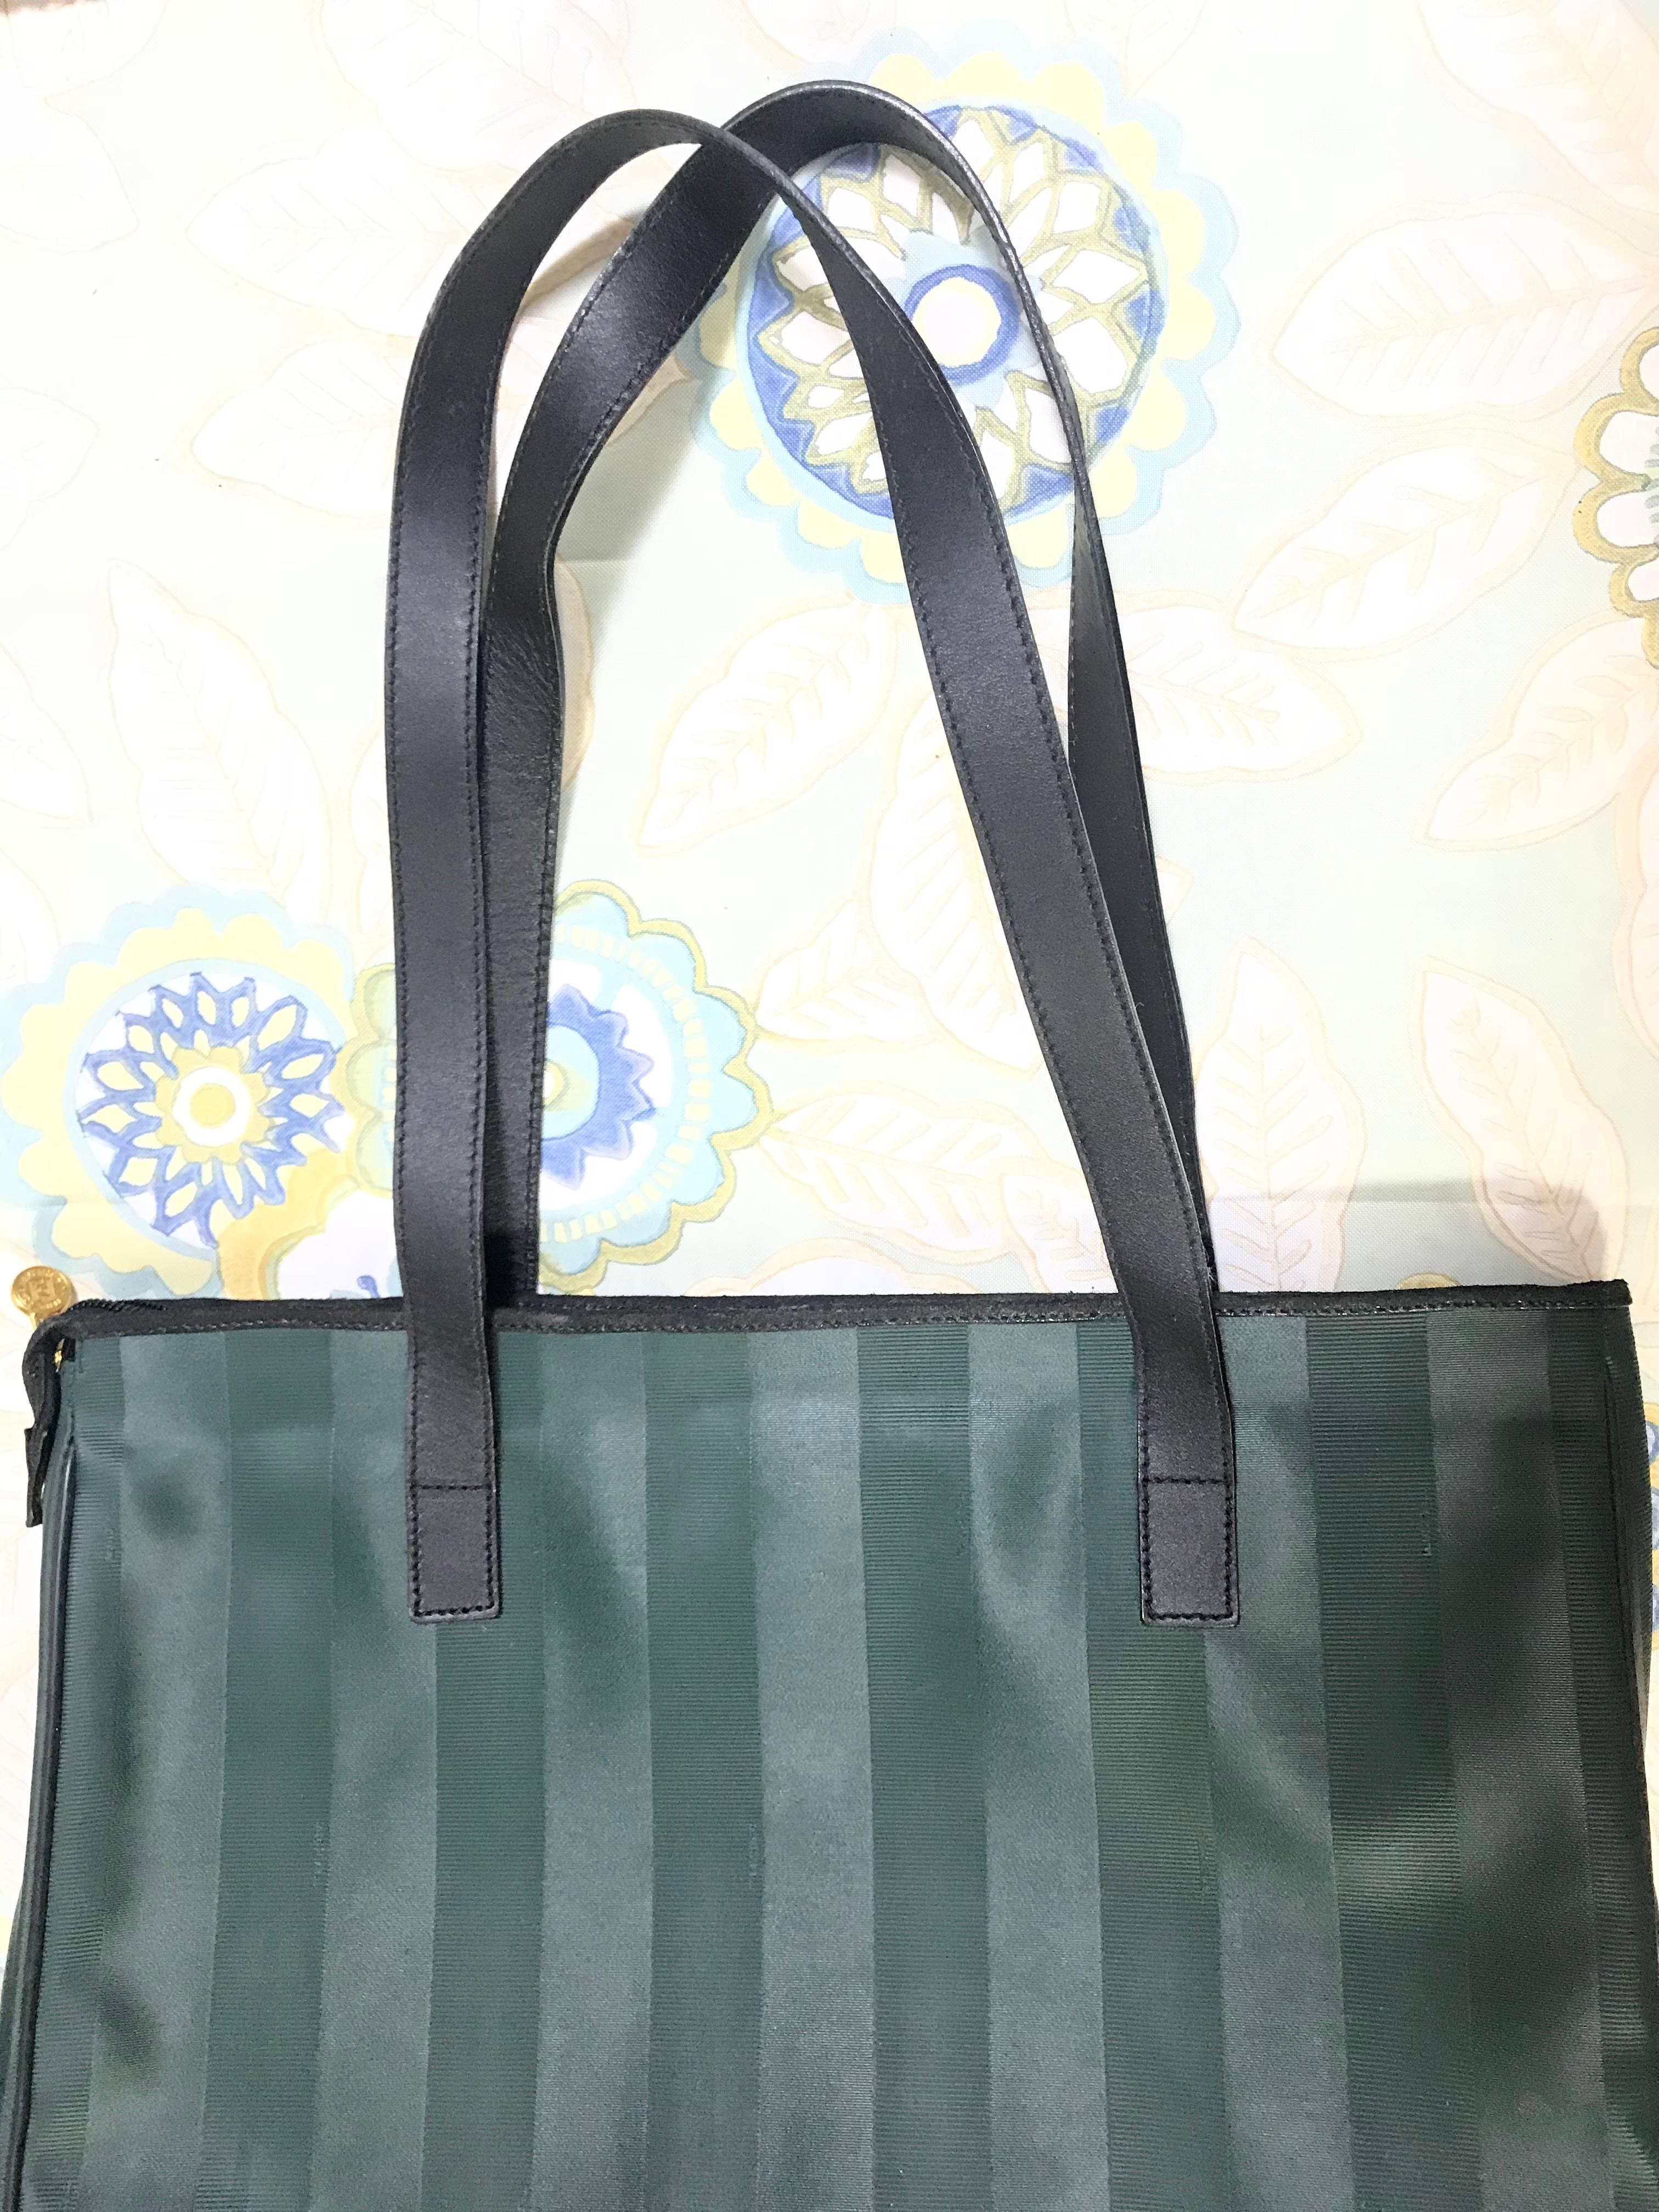 8e4a3eab60 ... best black listings vintage fendi classic dark green pecan stripe large  shopper tote bag. for